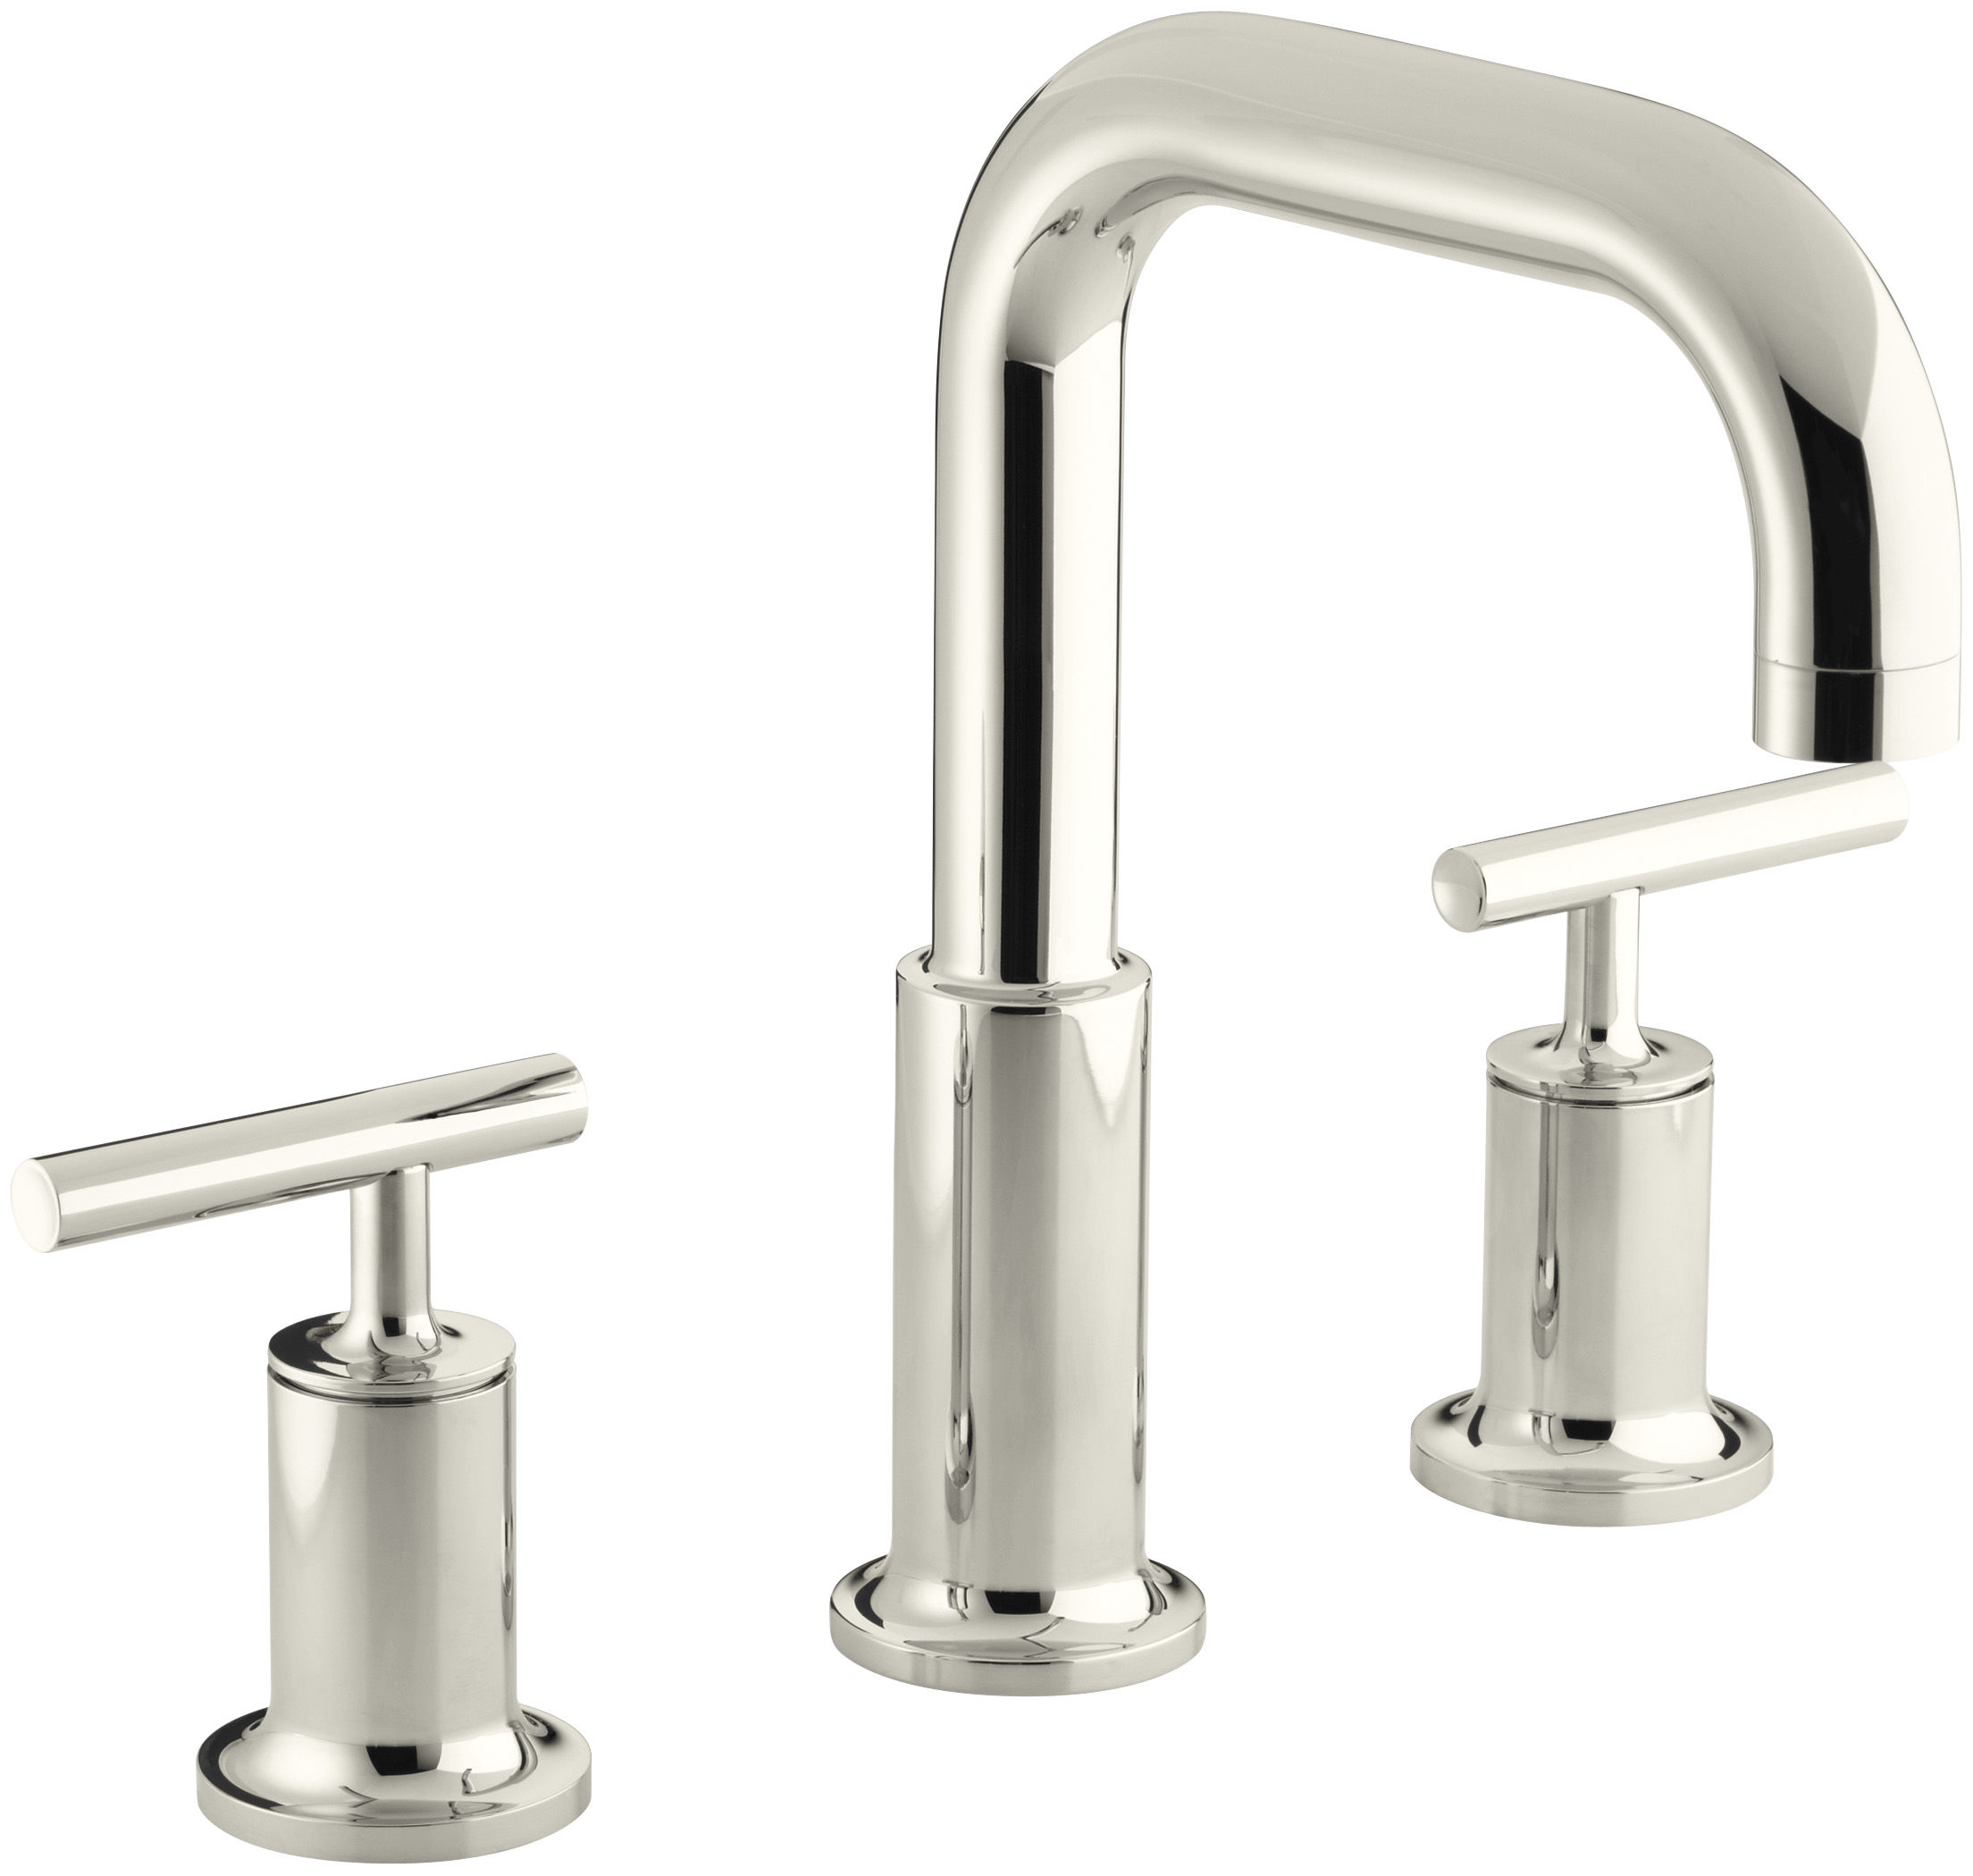 tub modern bathroom waterfall faucets bathtub faucet good kohler ultra widespread